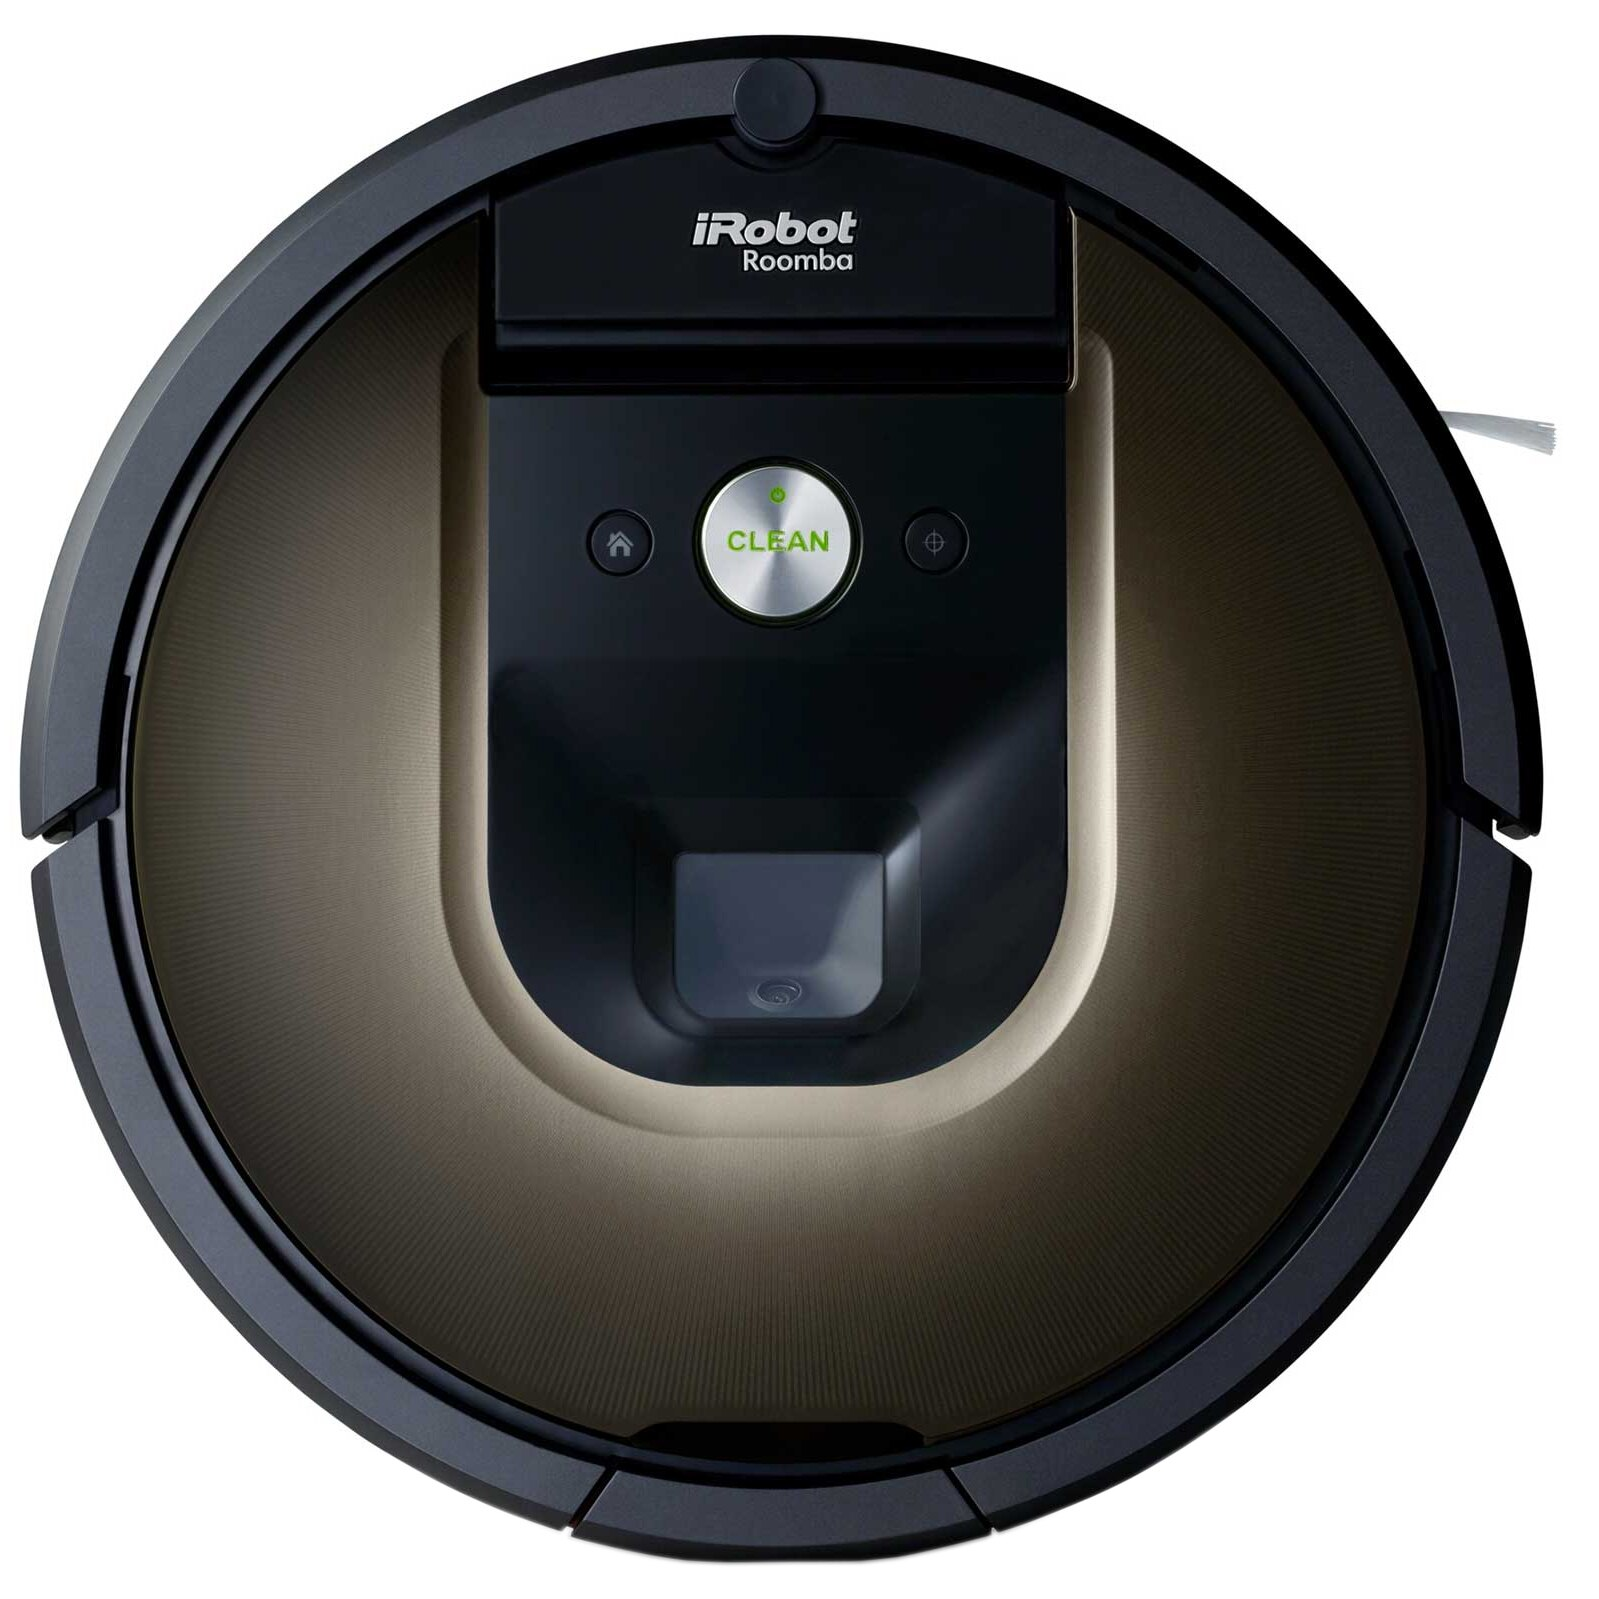 Fotografie Robot de aspirare iRobot Roomba 980, Navigare iAdapt, Carpet Boost, Filtru dublu Hepa, Curatare AeroForce, Negru/Maro